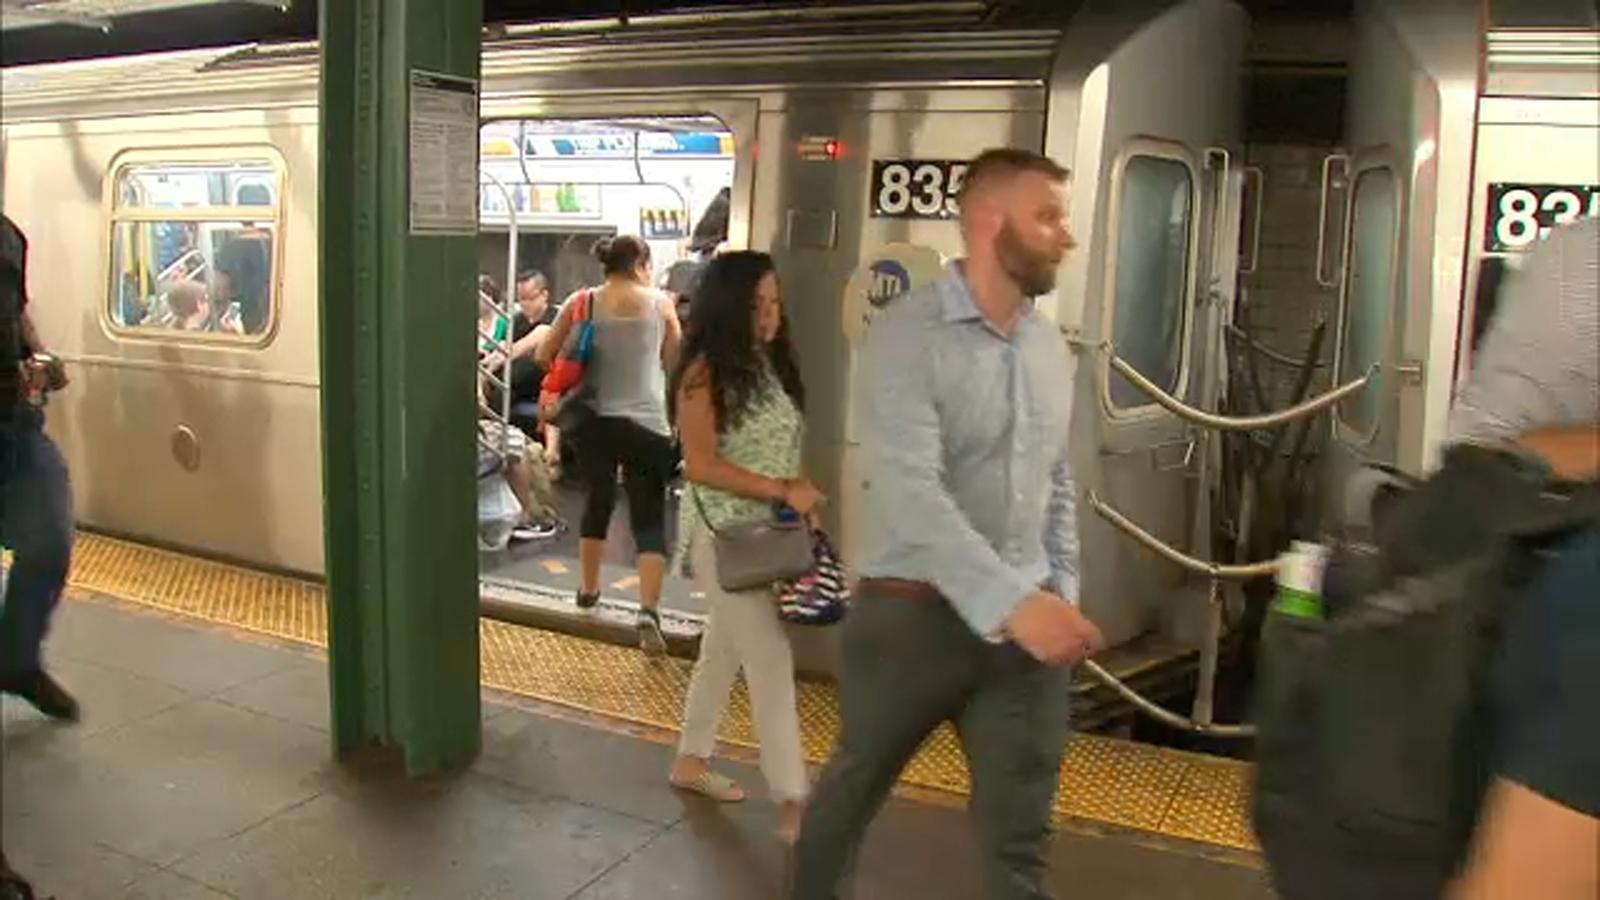 MTA says may cut New York City subway, bus service in fall am budge concerns